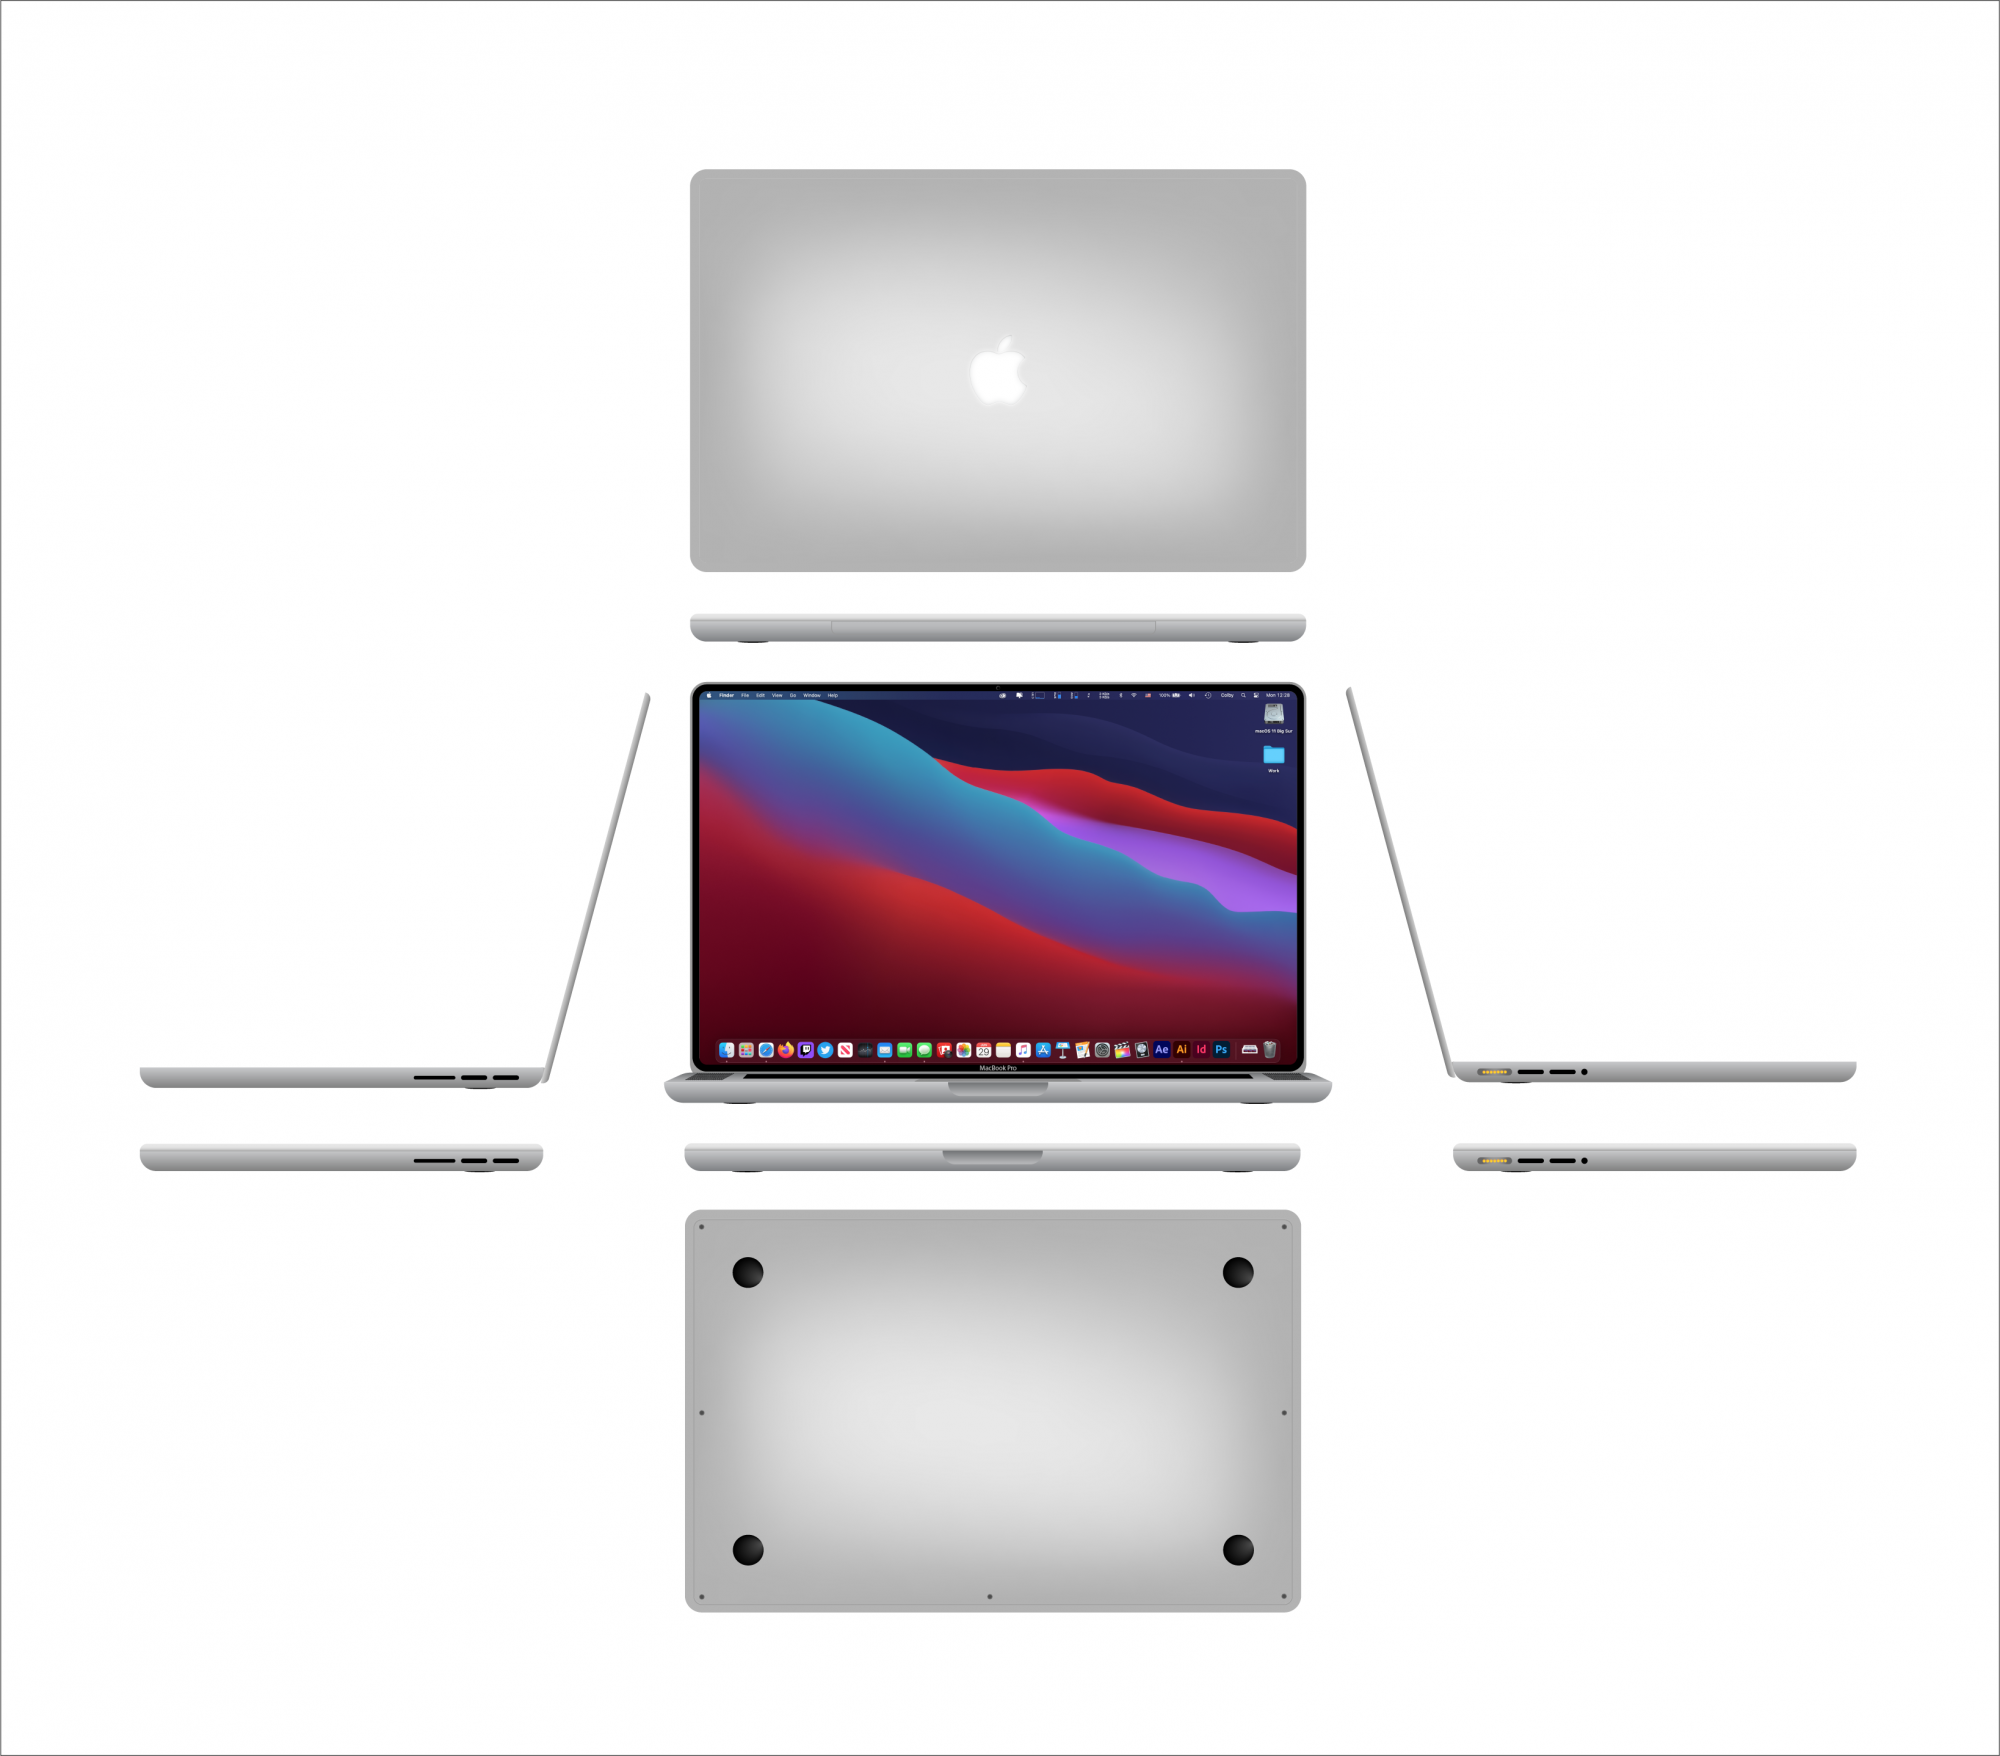 "2021 MacBook Pro 16"" Concept Design I created on Adobe ..."